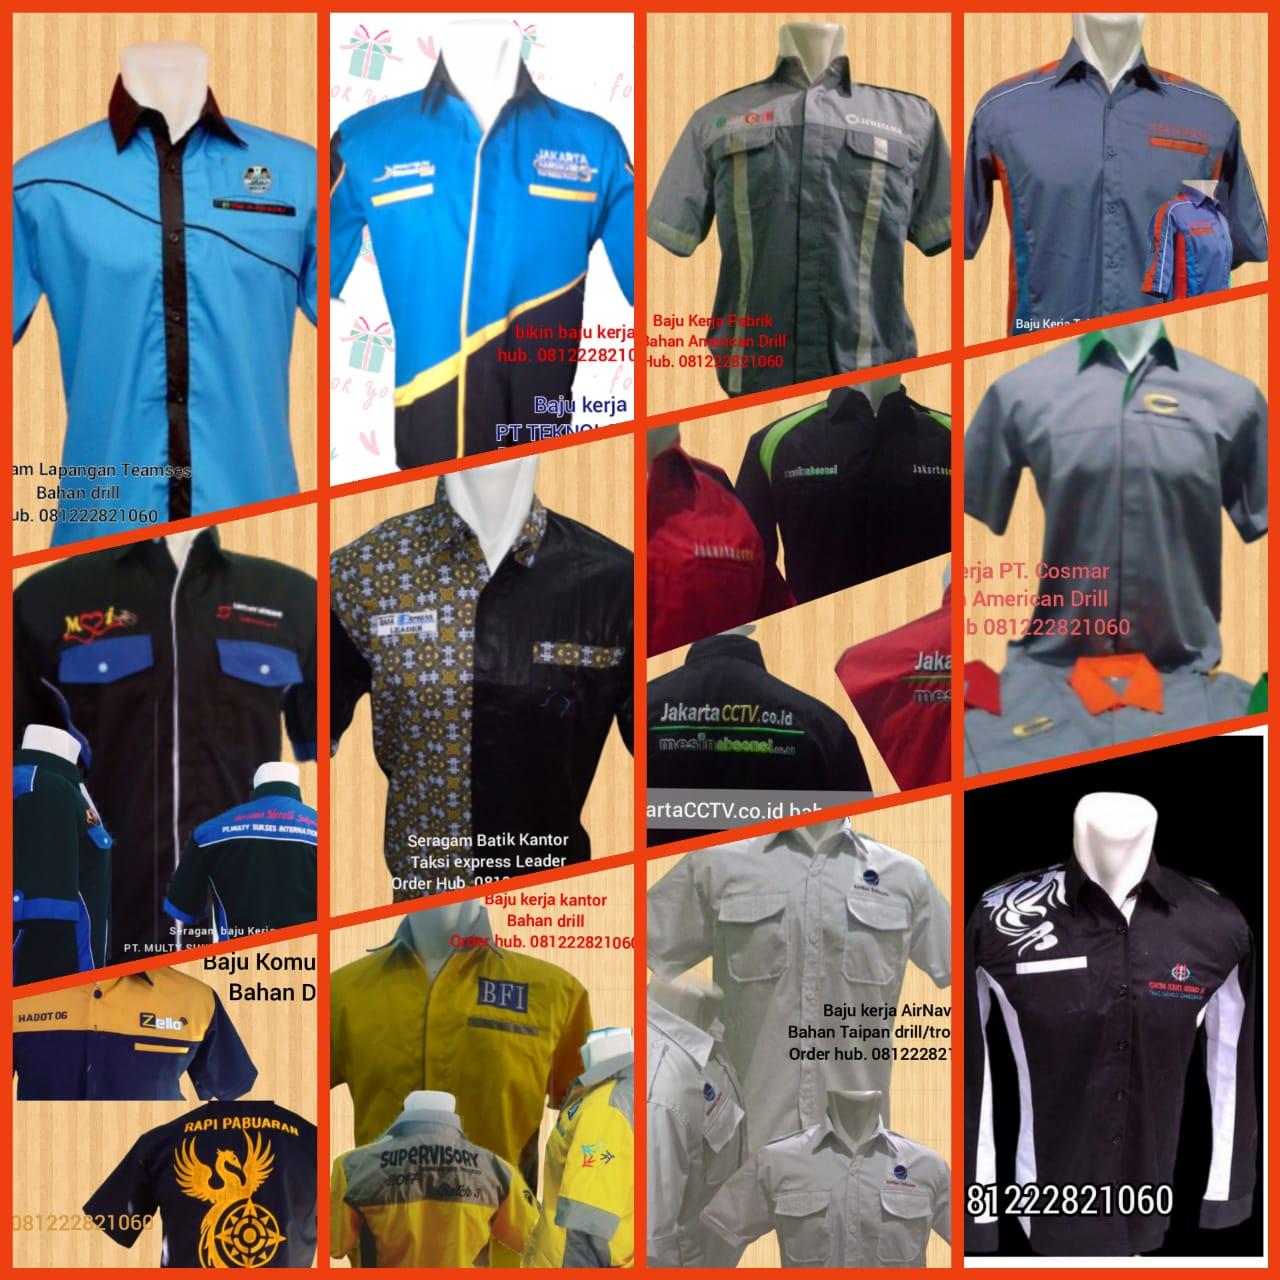 Baju Seragam Kerja Lapangan Kota Pariaman Sumatera Barat